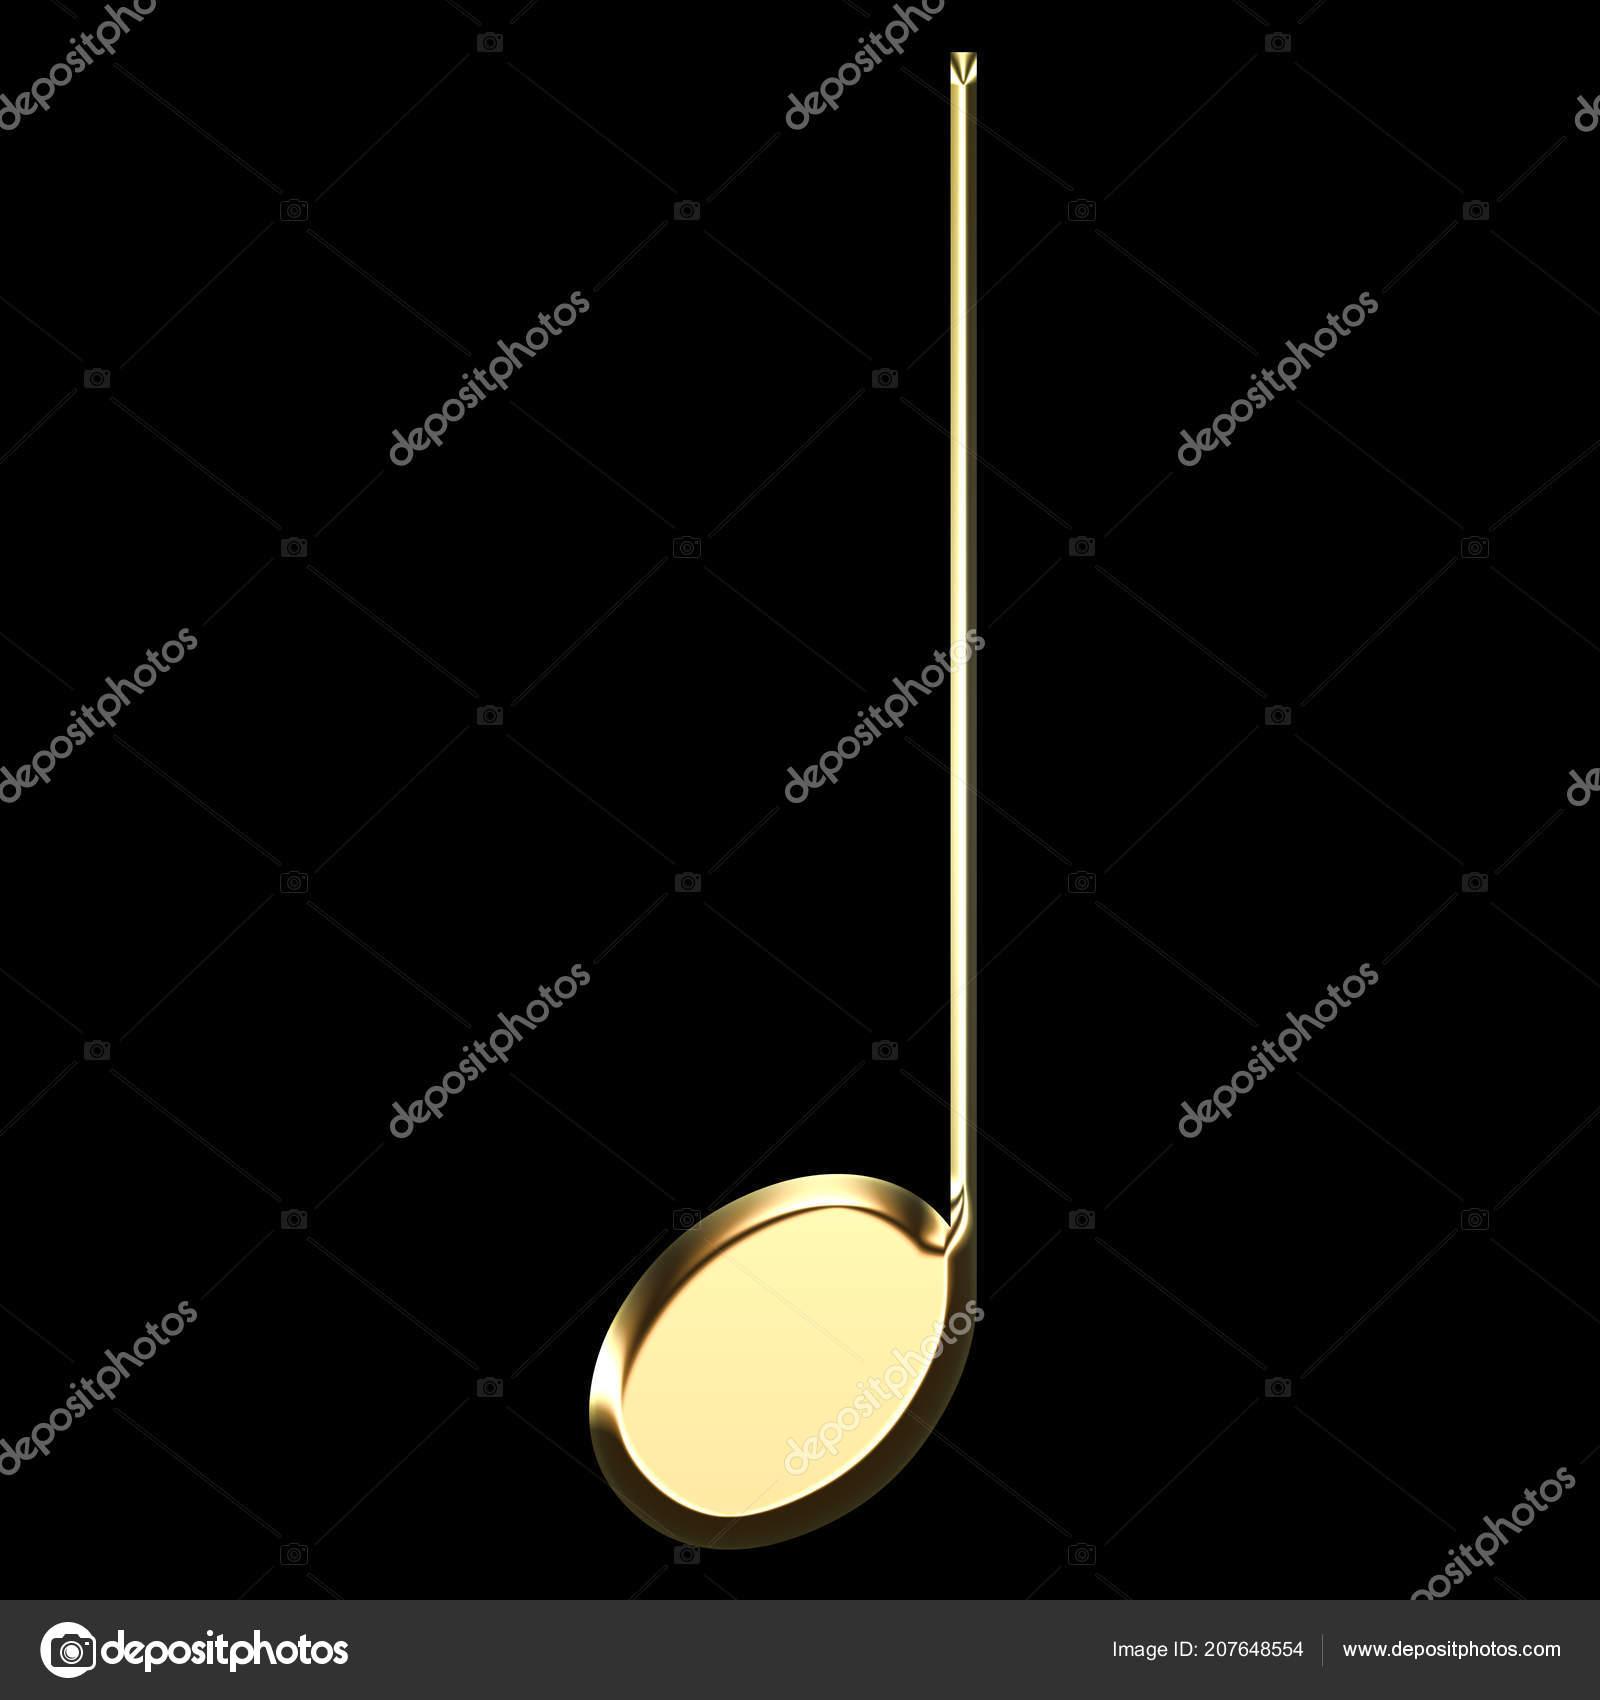 Golden Music Note Illustration Quarter Note Musical Symbol Black